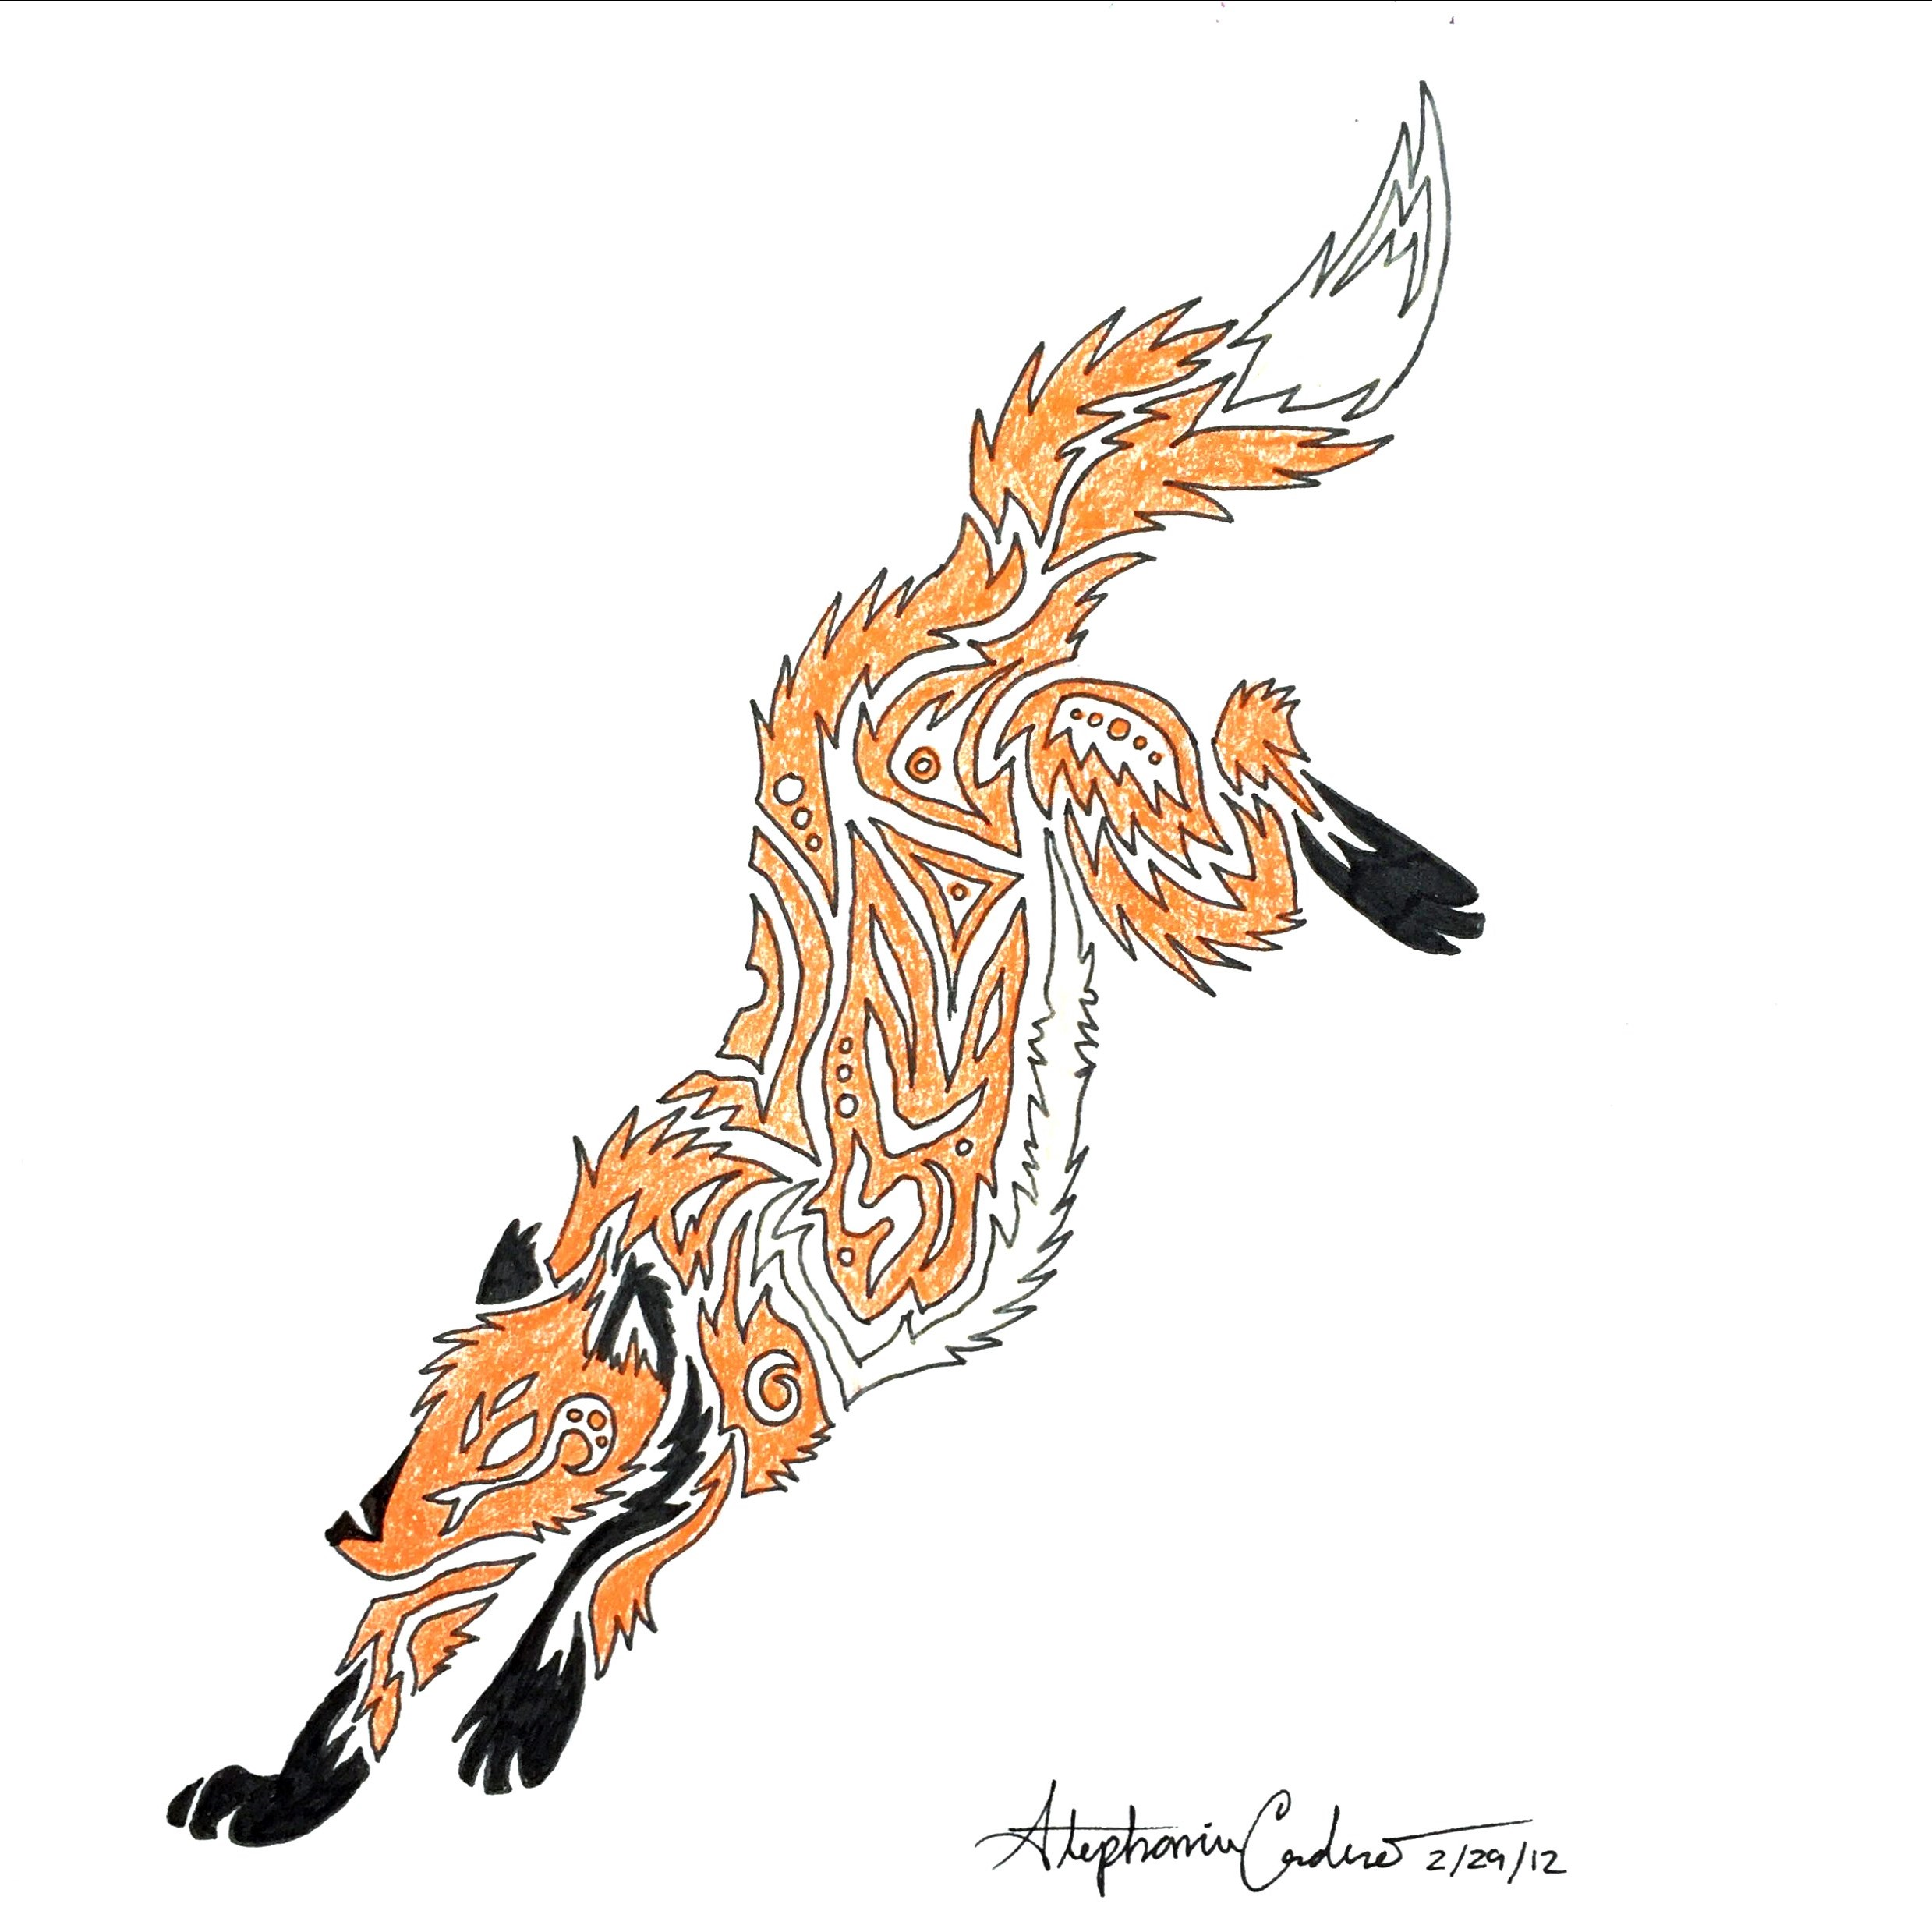 LEAP OF FOX